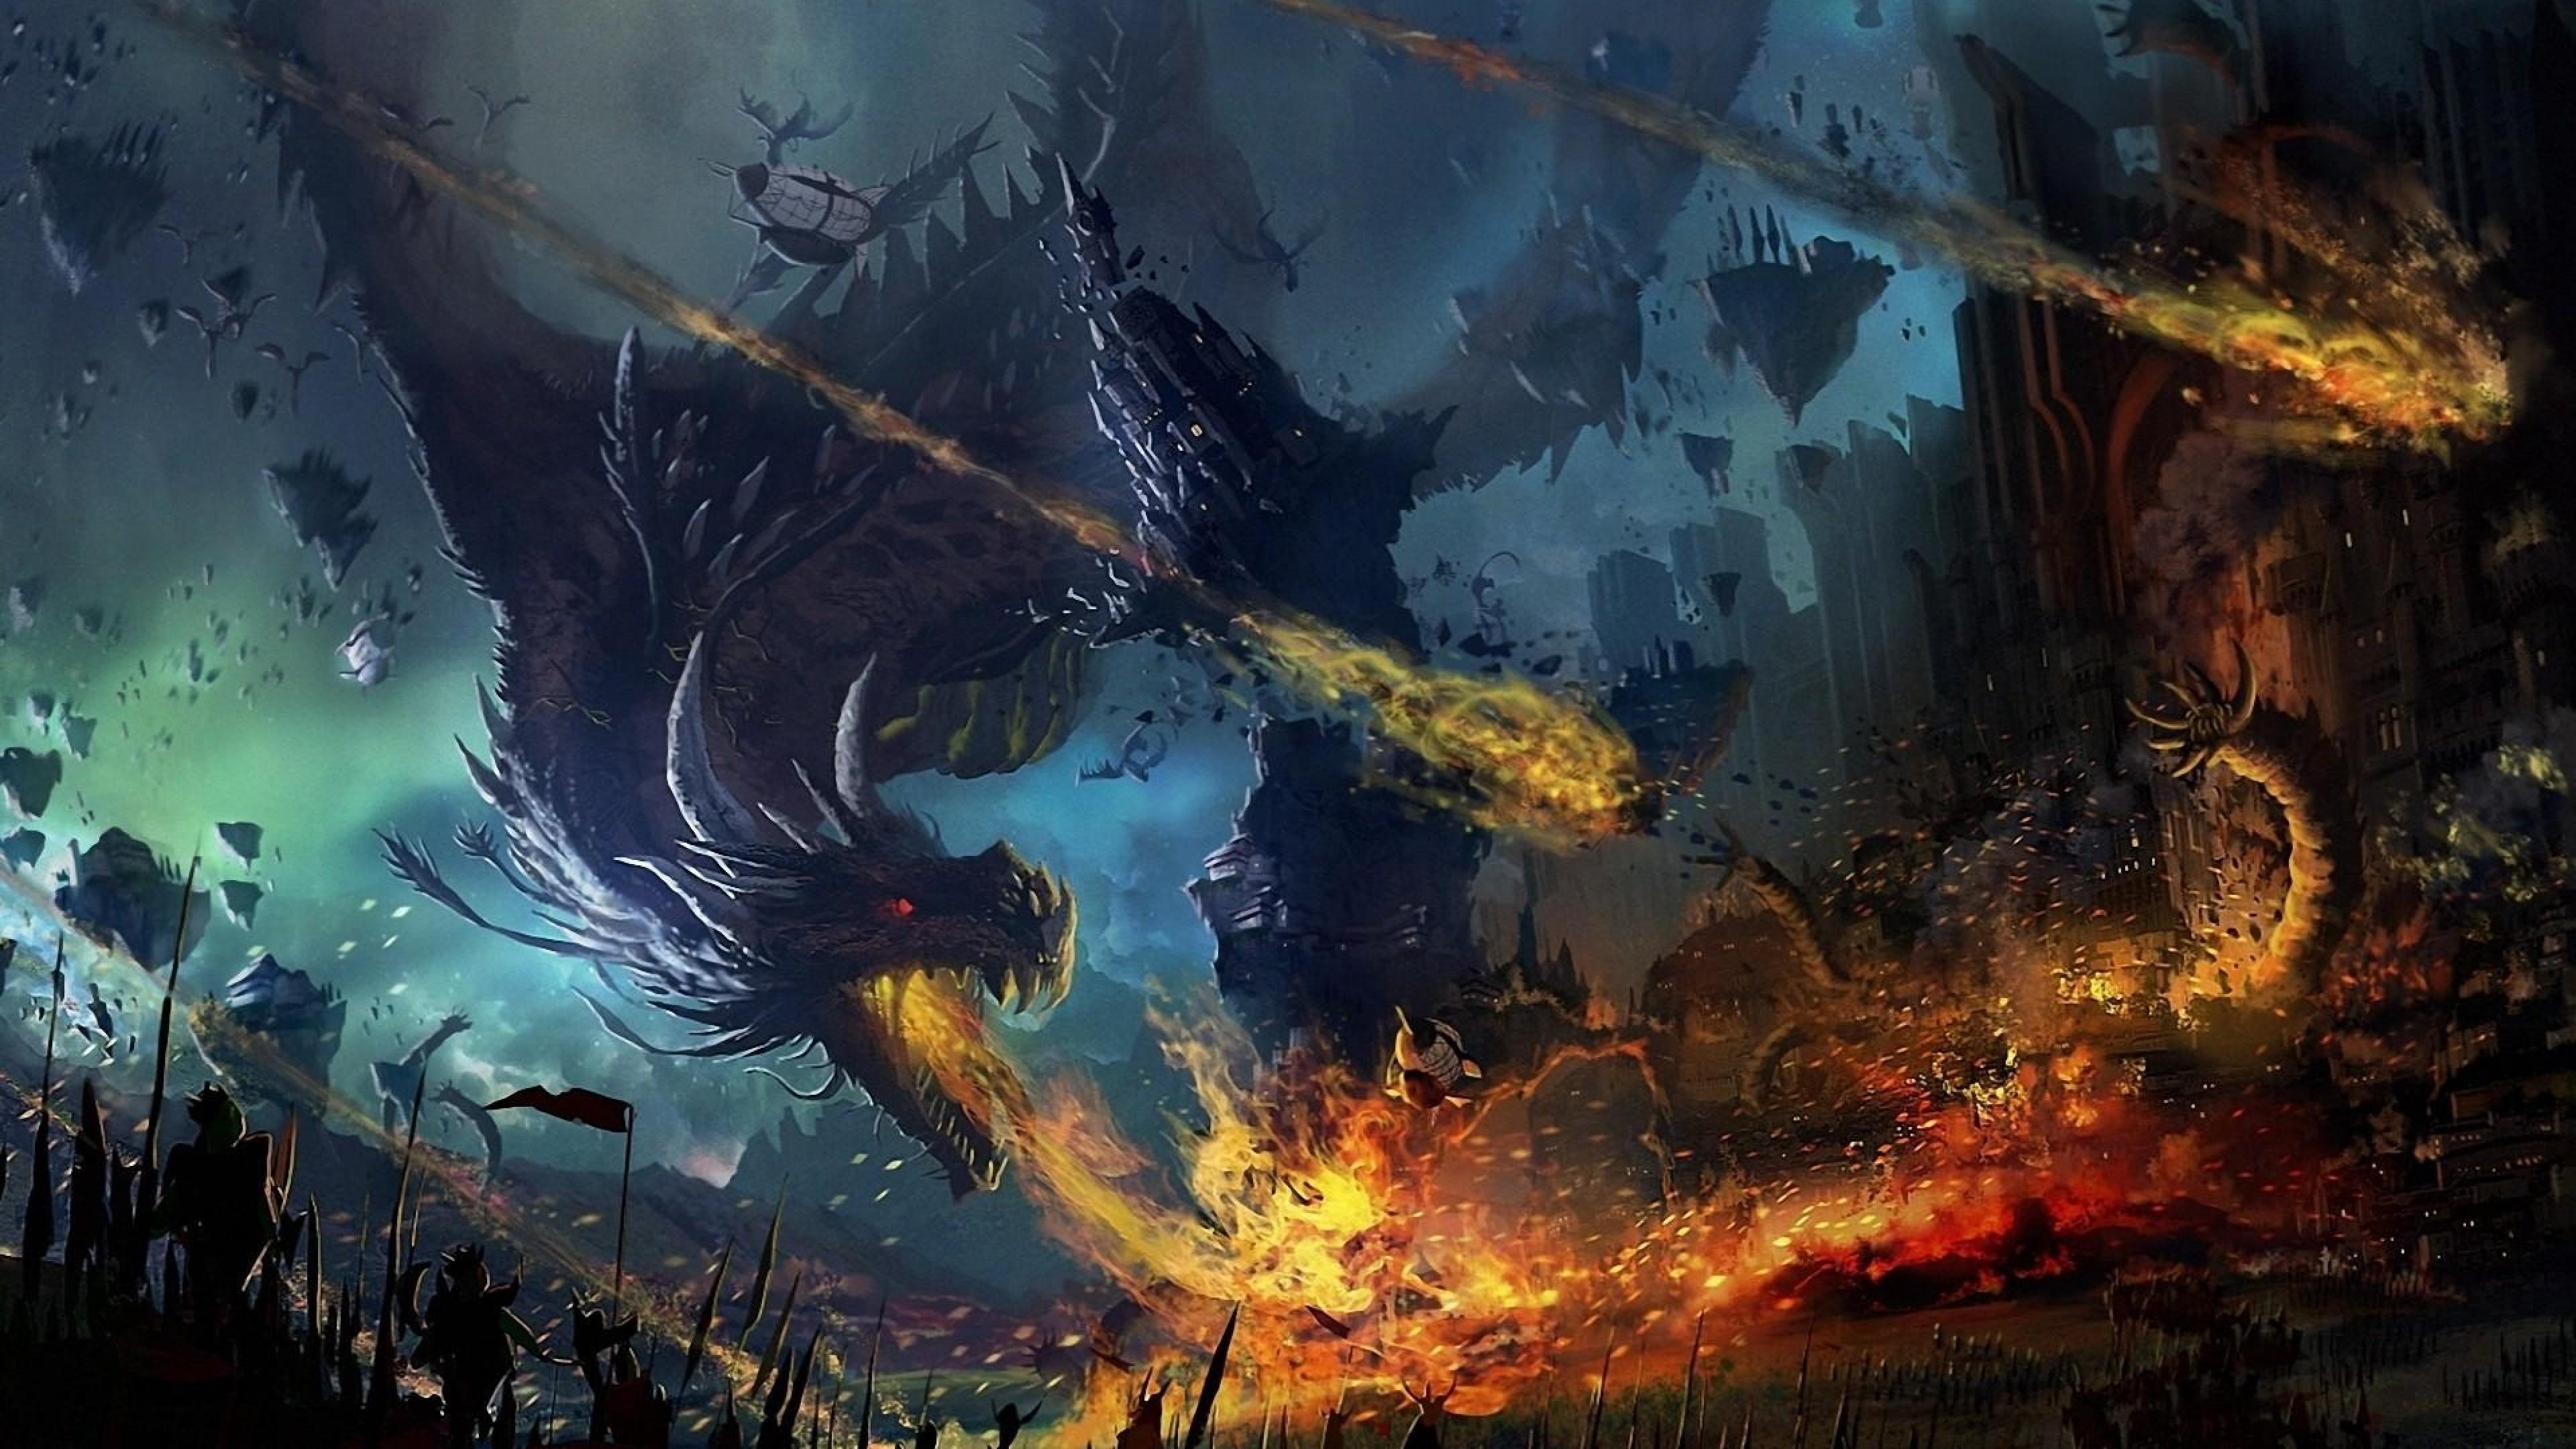 … Background 4K Ultra HD. Wallpaper dragon, fall, fire, flame,  war, battle